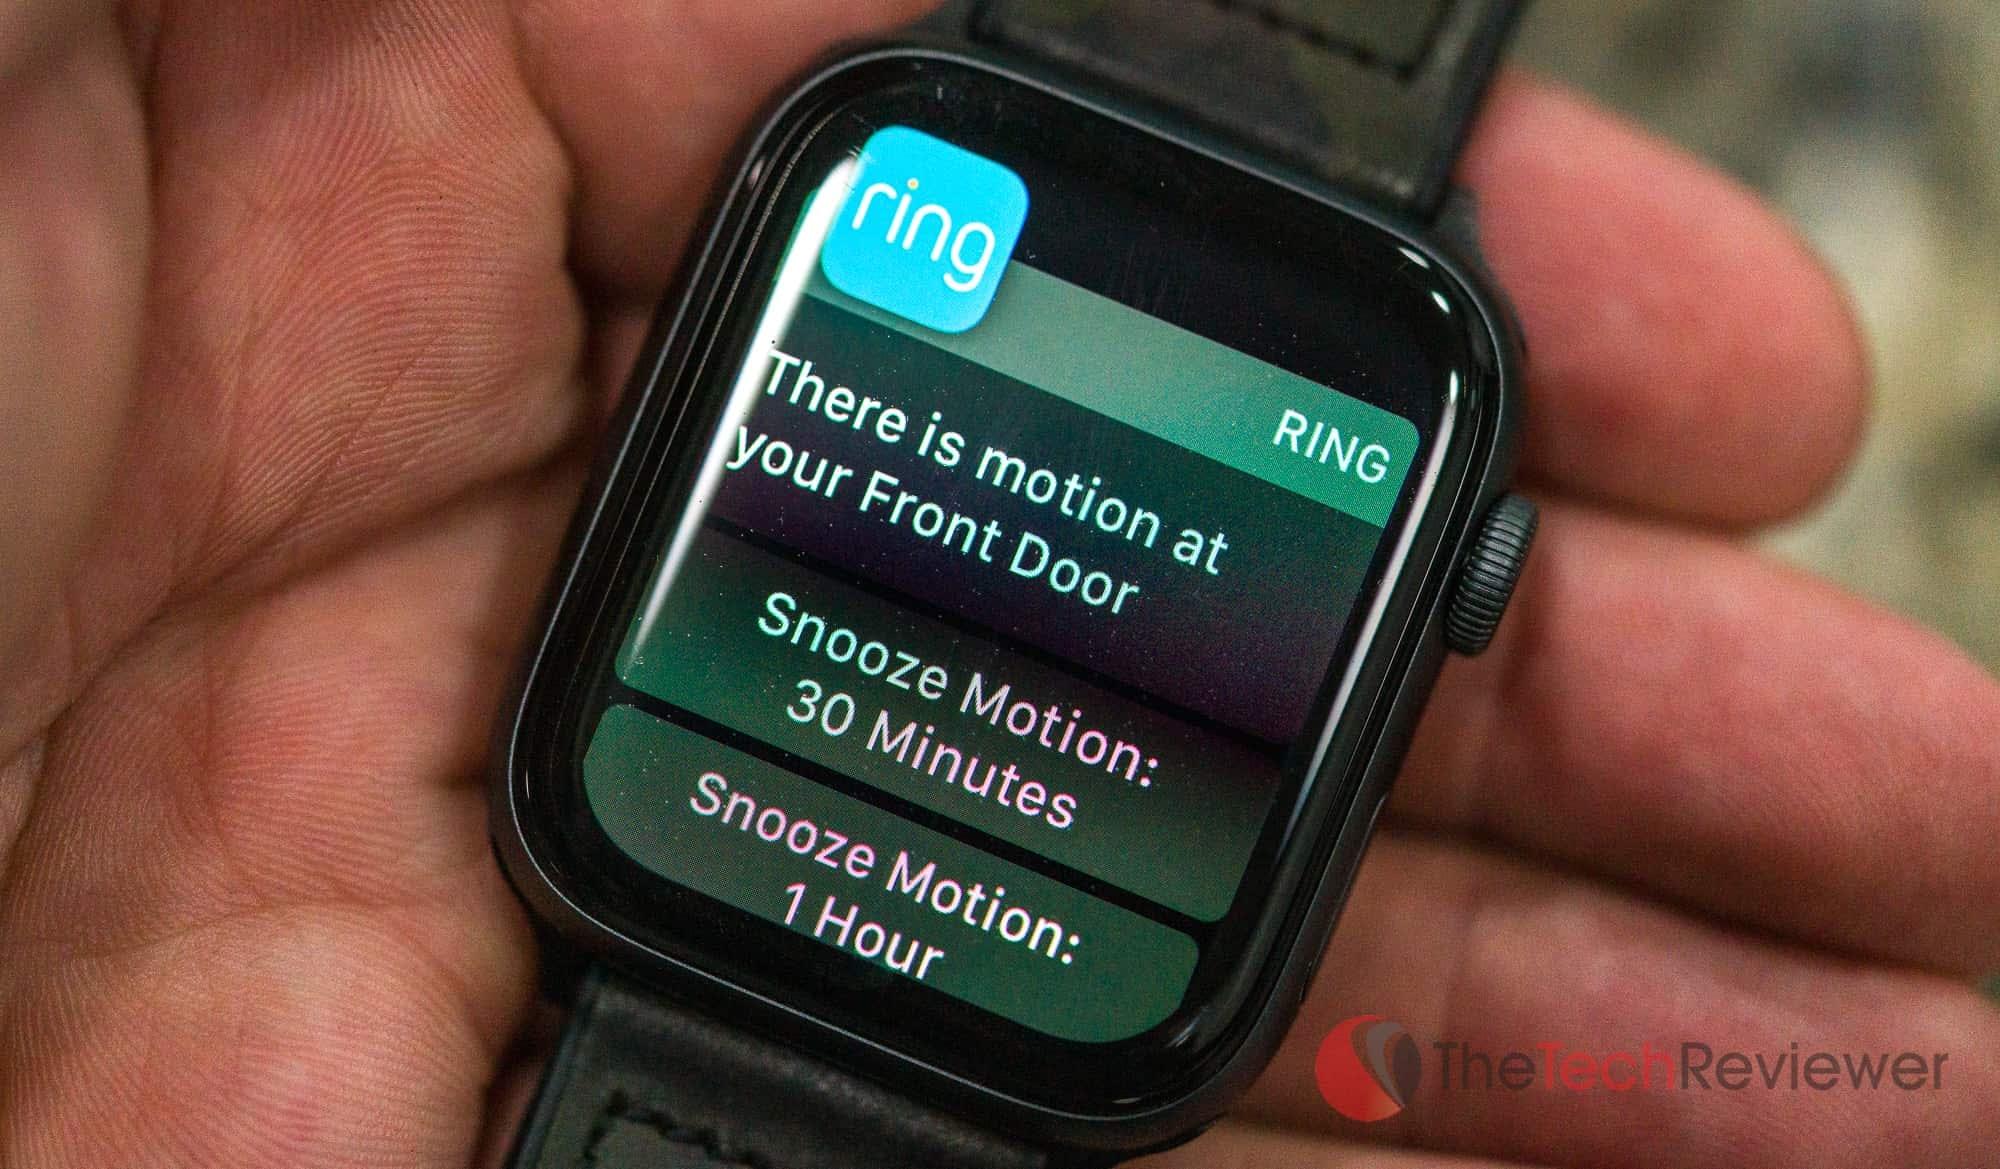 Apple Watch Ring Notification